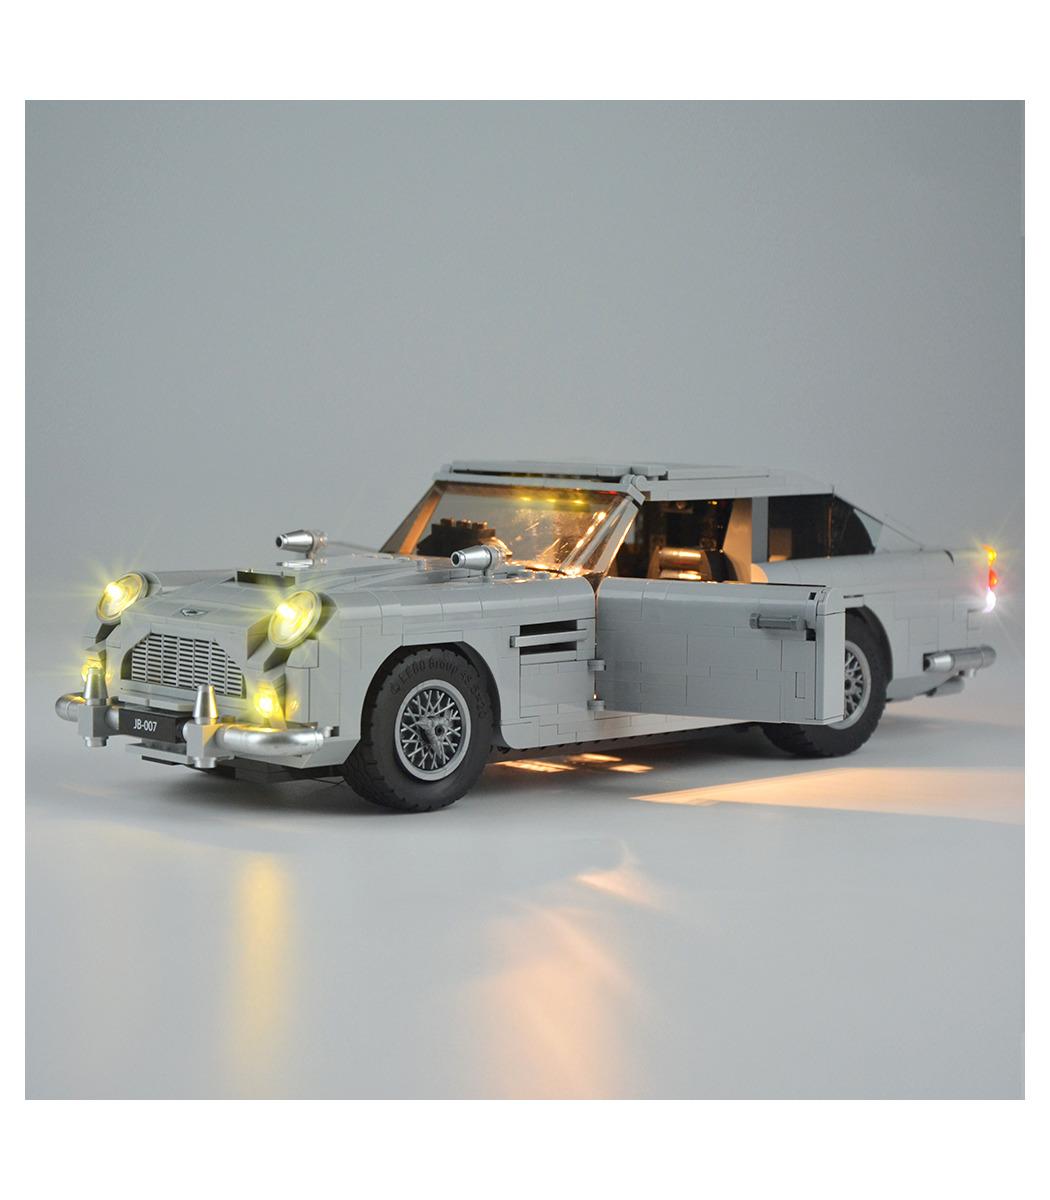 Licht Kit Für James Bond Aston Martin Db5 Led Beleuchtungs Set 10262 Buildingtoystore Com